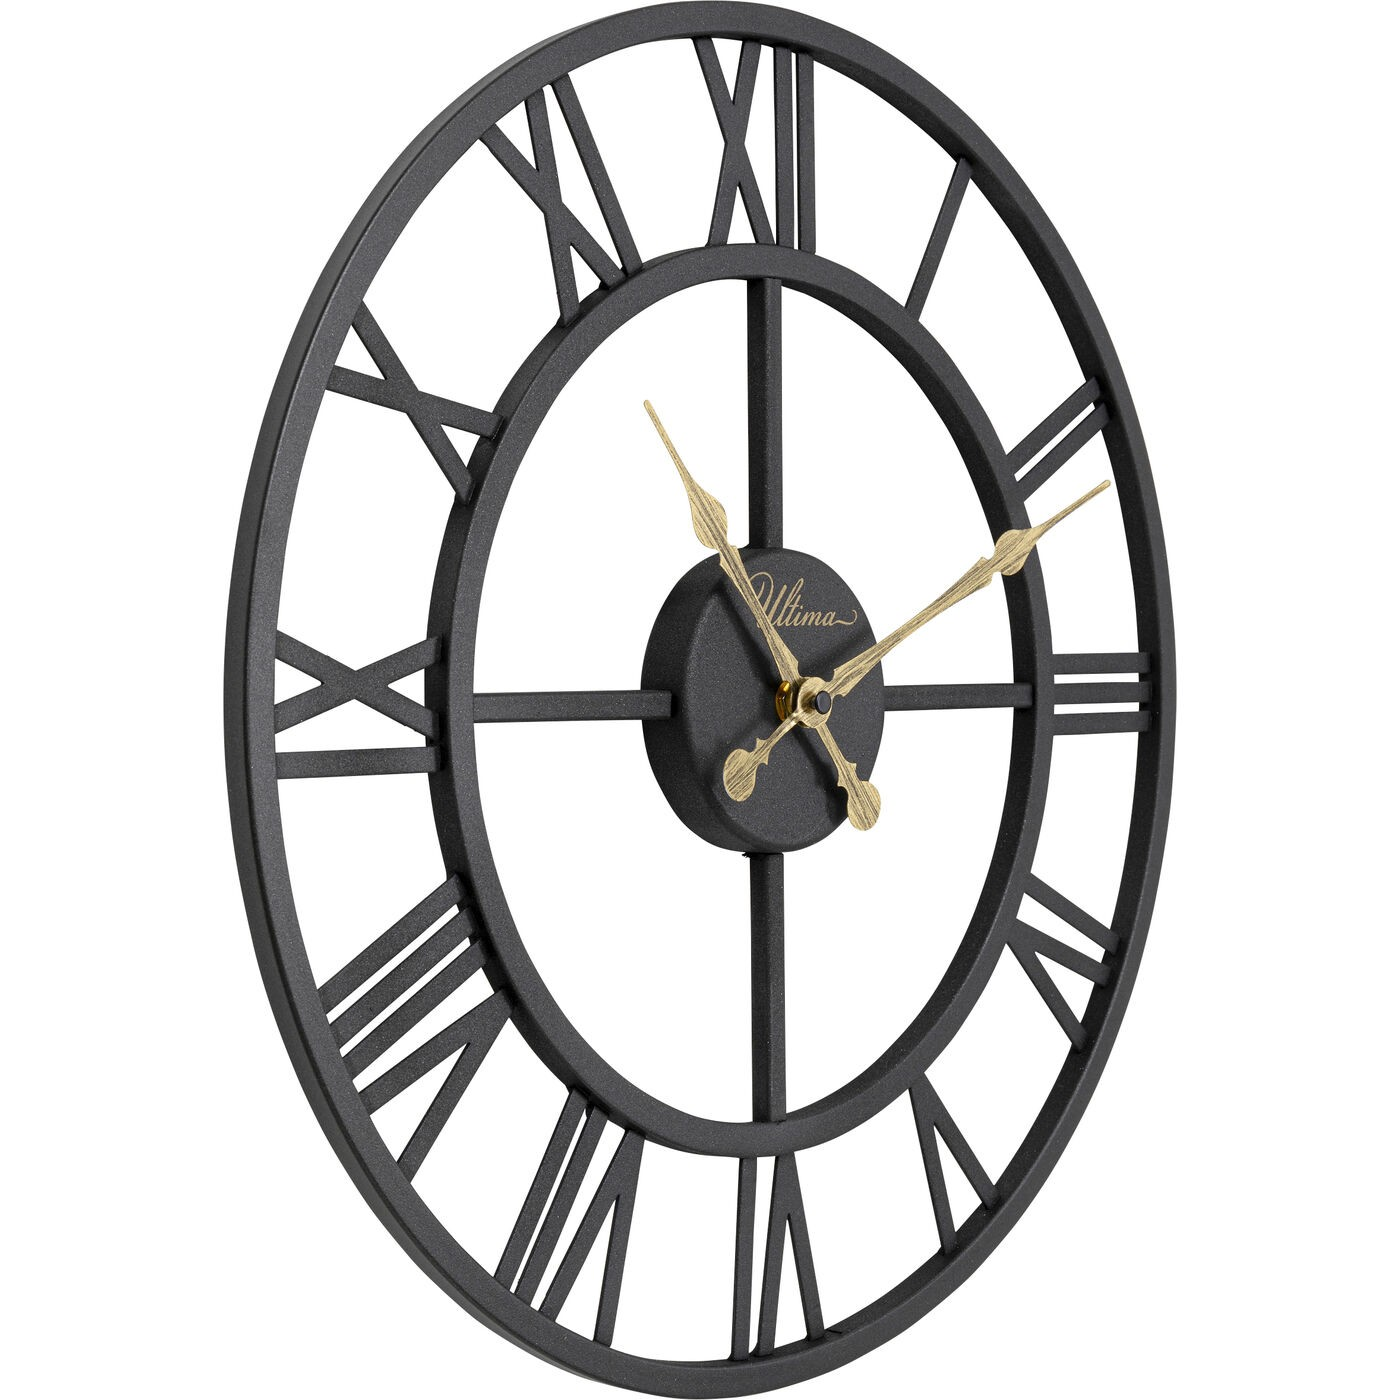 Horloge murale Roman 41cm noire Kare Design